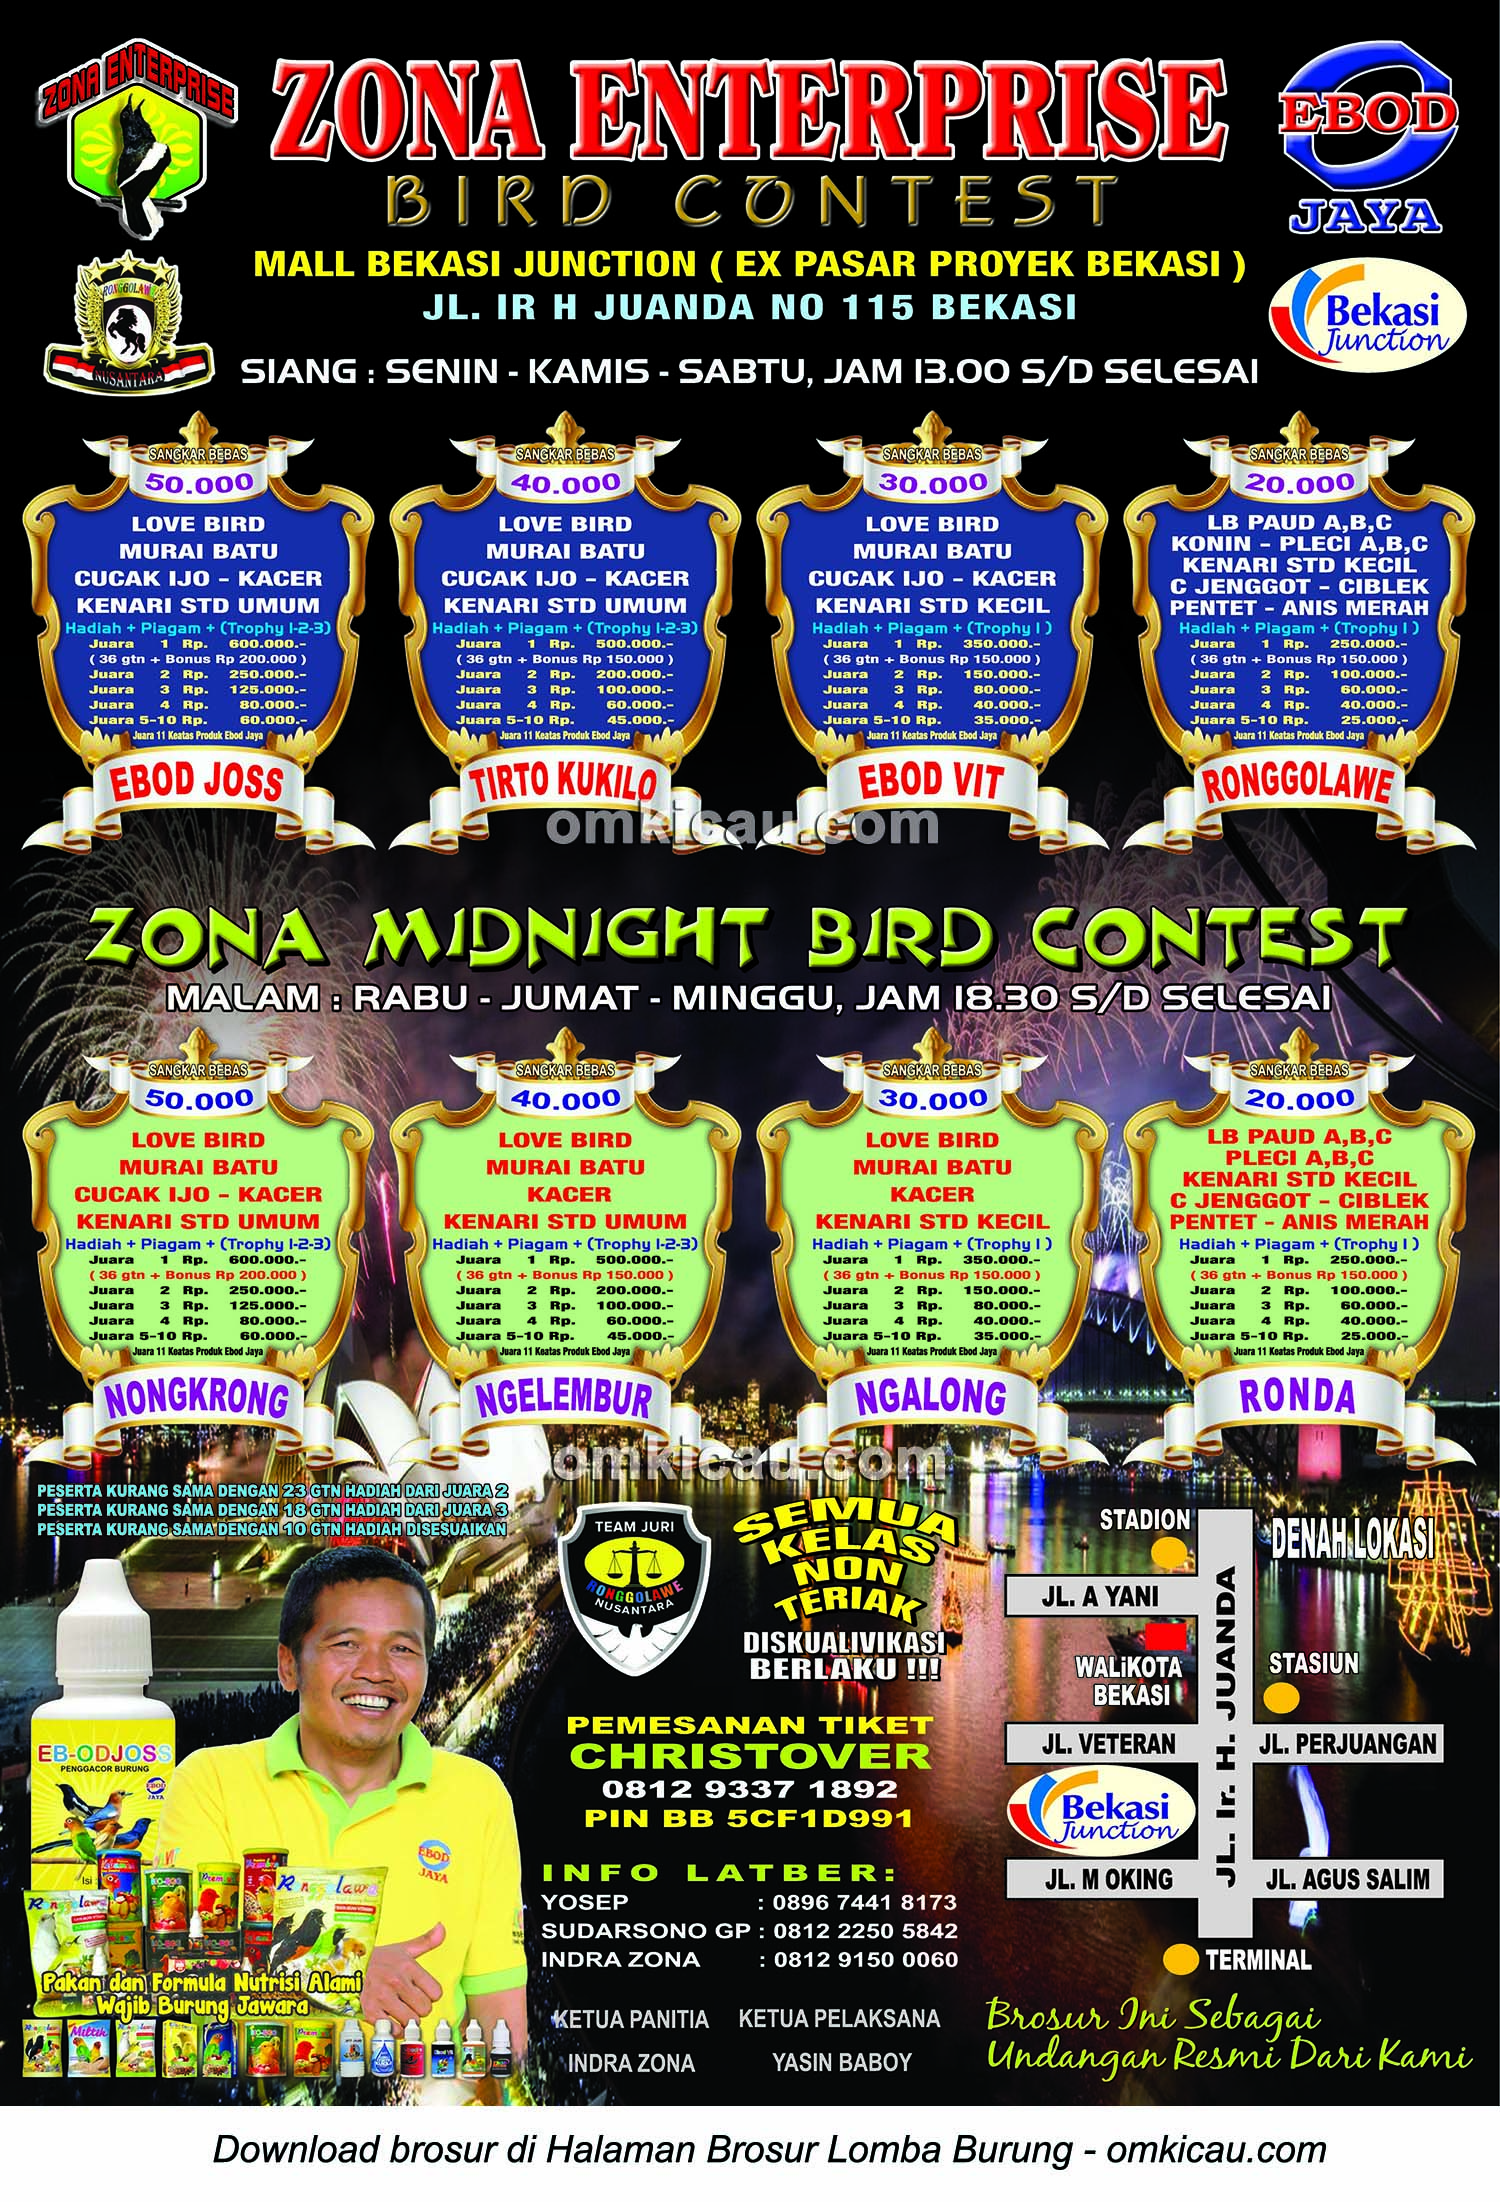 Jadwal kegiatan Zona Midnight Bird Contest